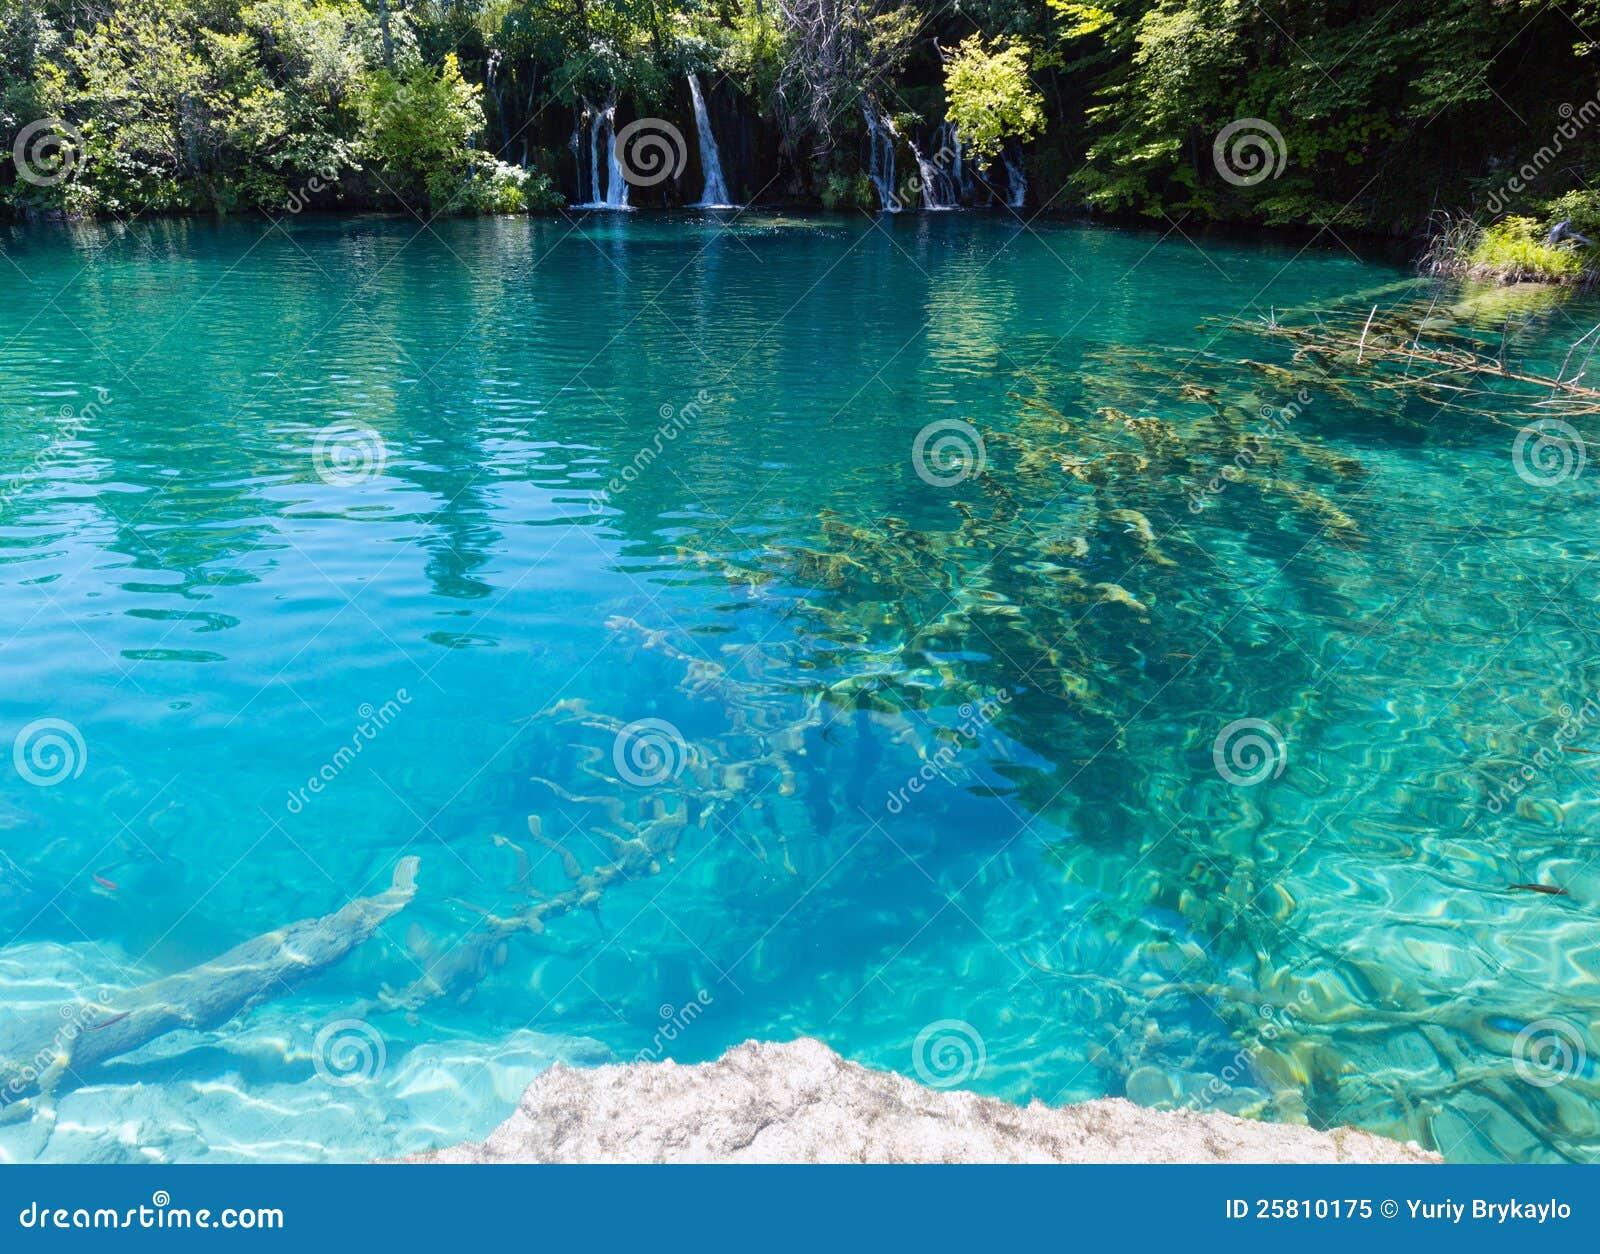 plitvice lakes national park croatia stock image image of place